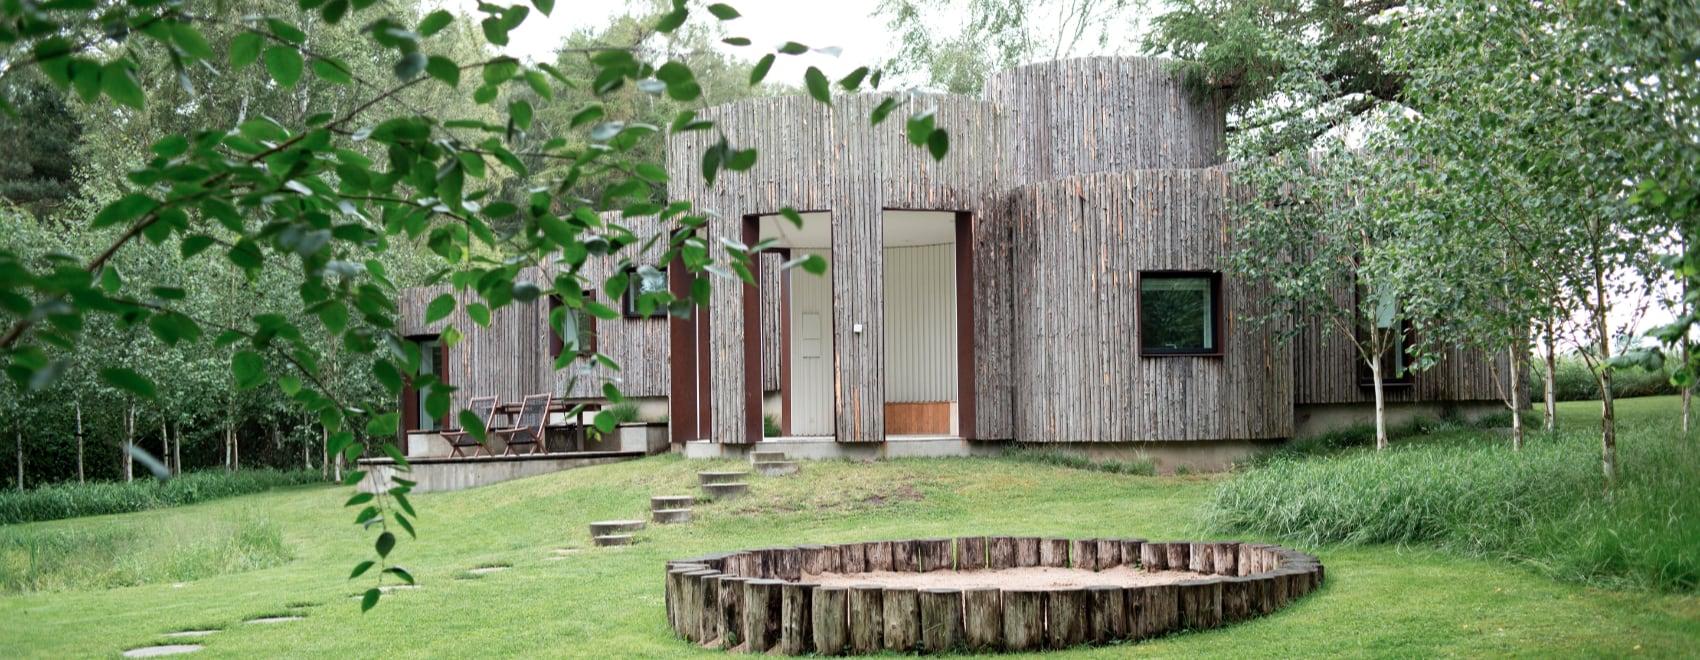 21 Backyard Layout Ideas How To Make An Awesome Backyard